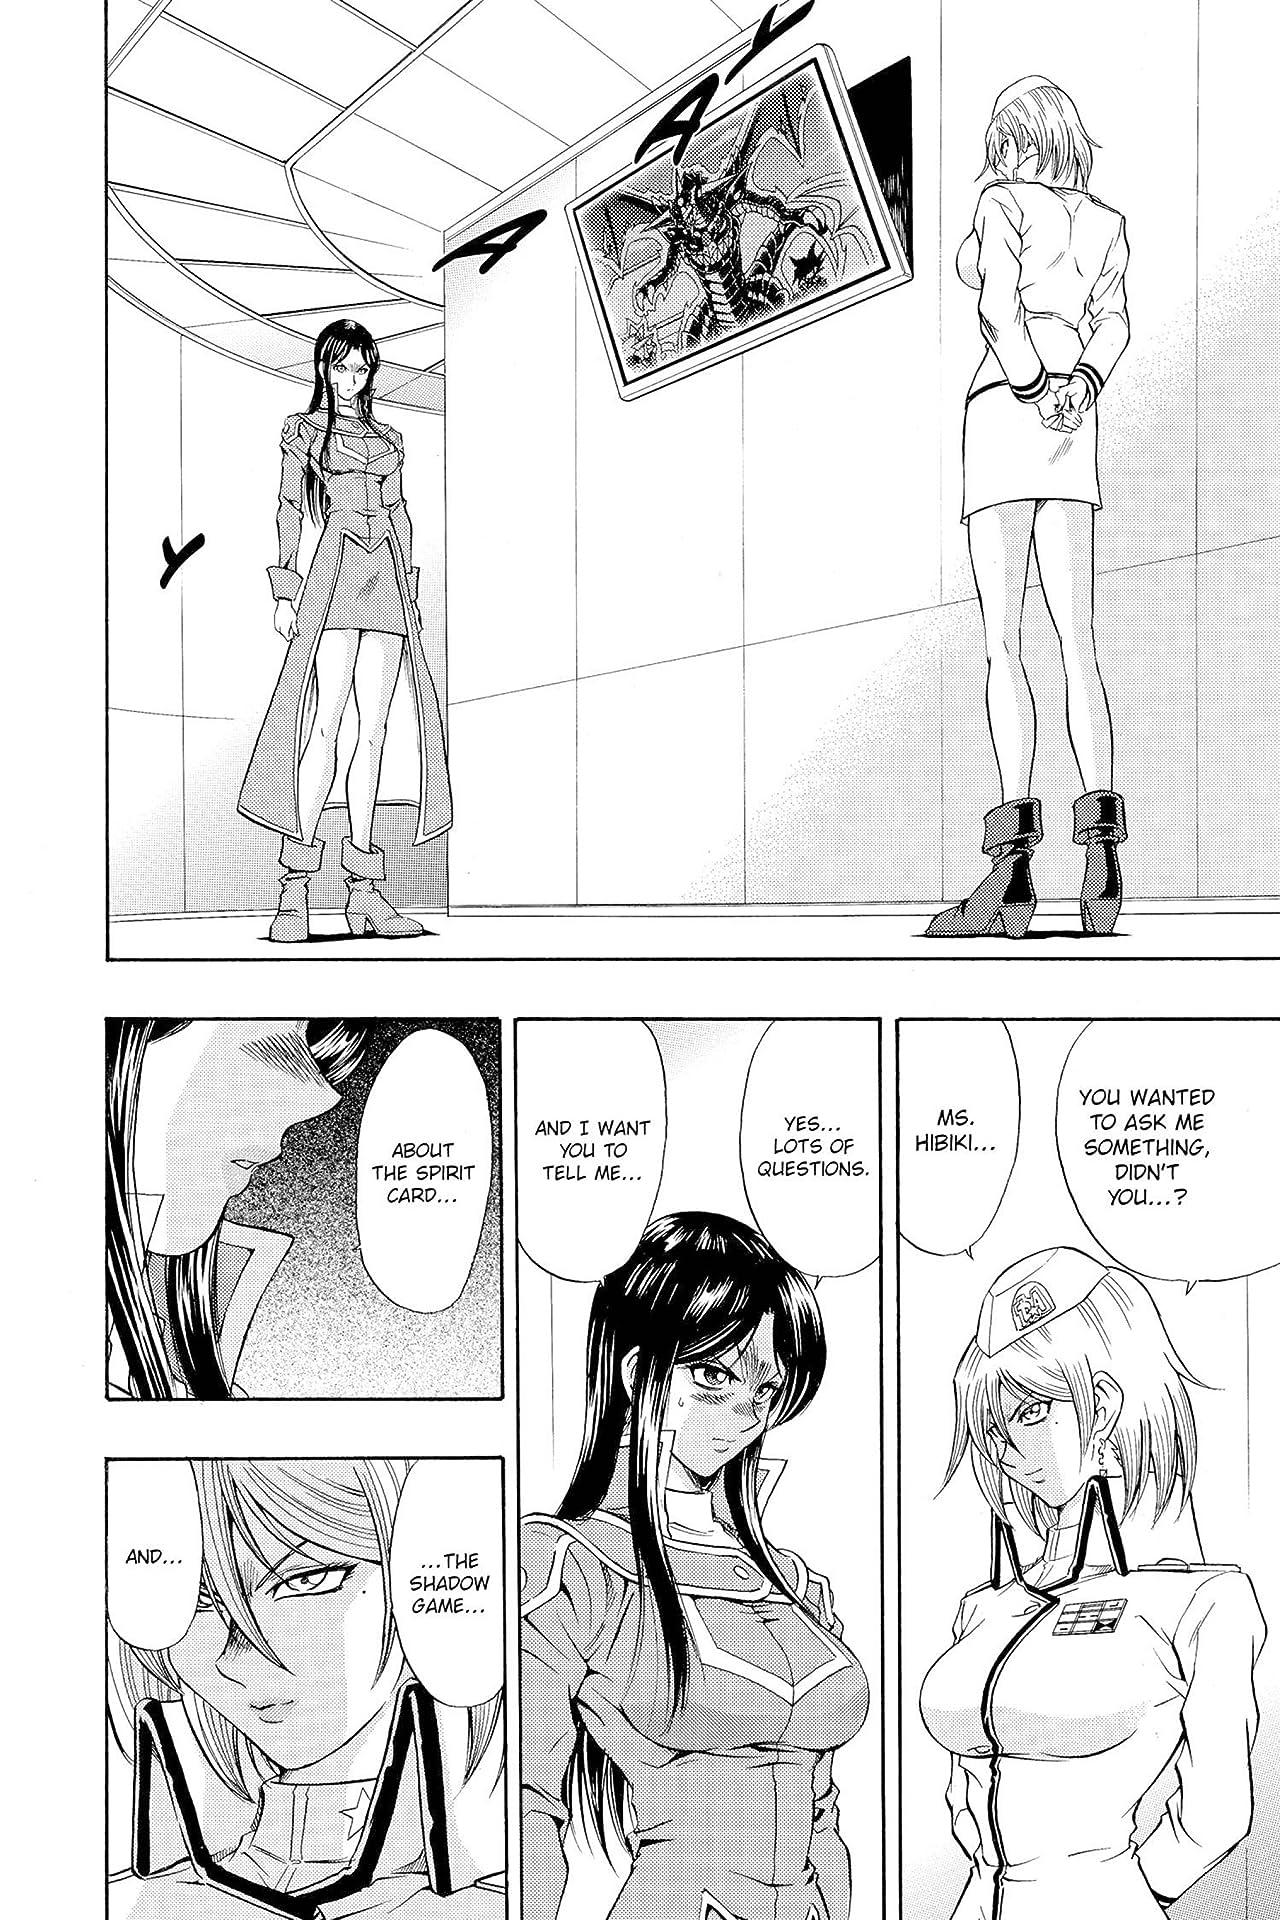 Yu-Gi-Oh! GX Vol. 5